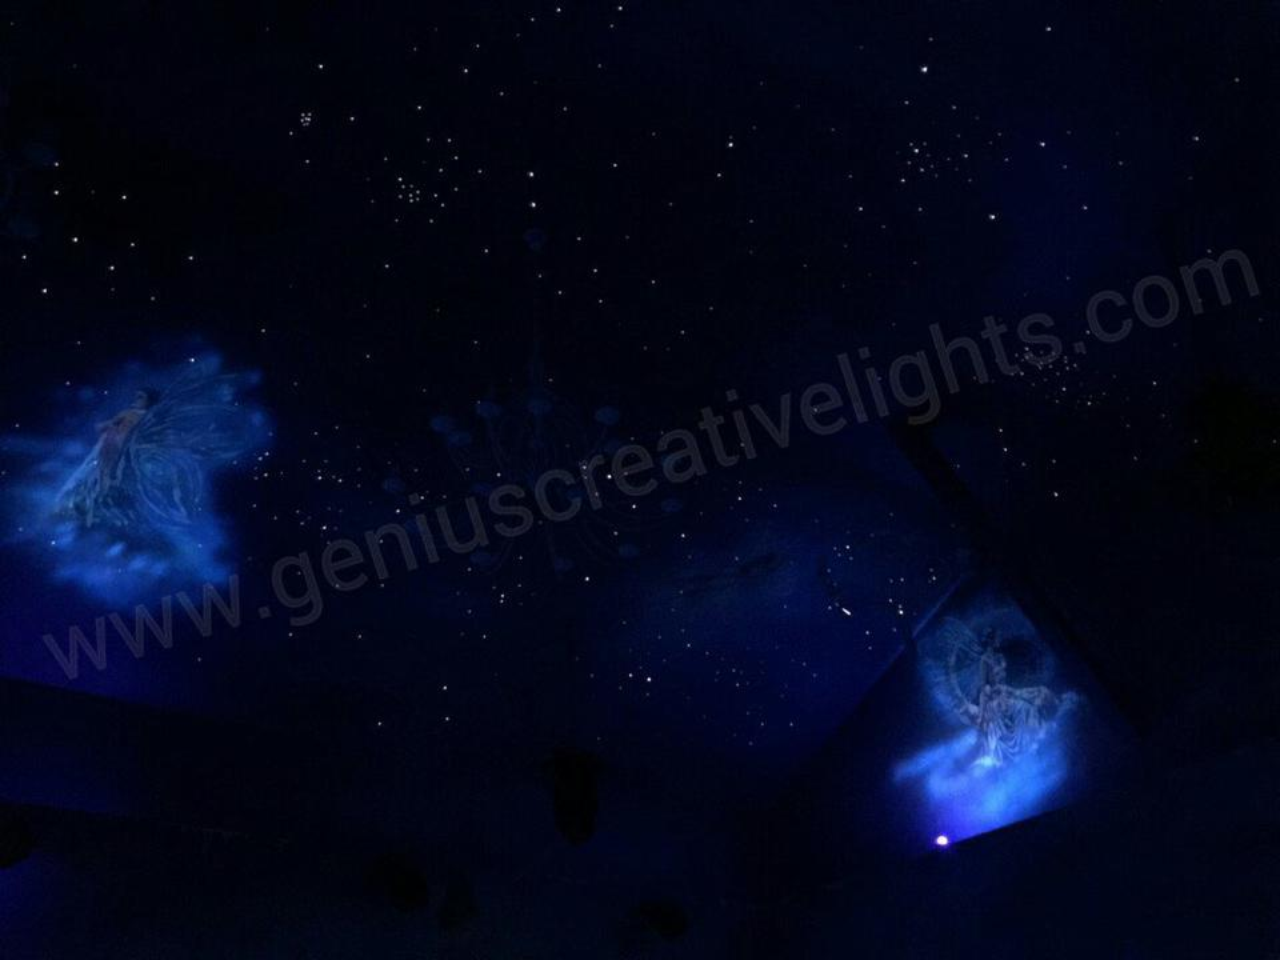 Fiber optic stars ceiling(ดาวบนฝ้าเพดาน) รูปที่ 3